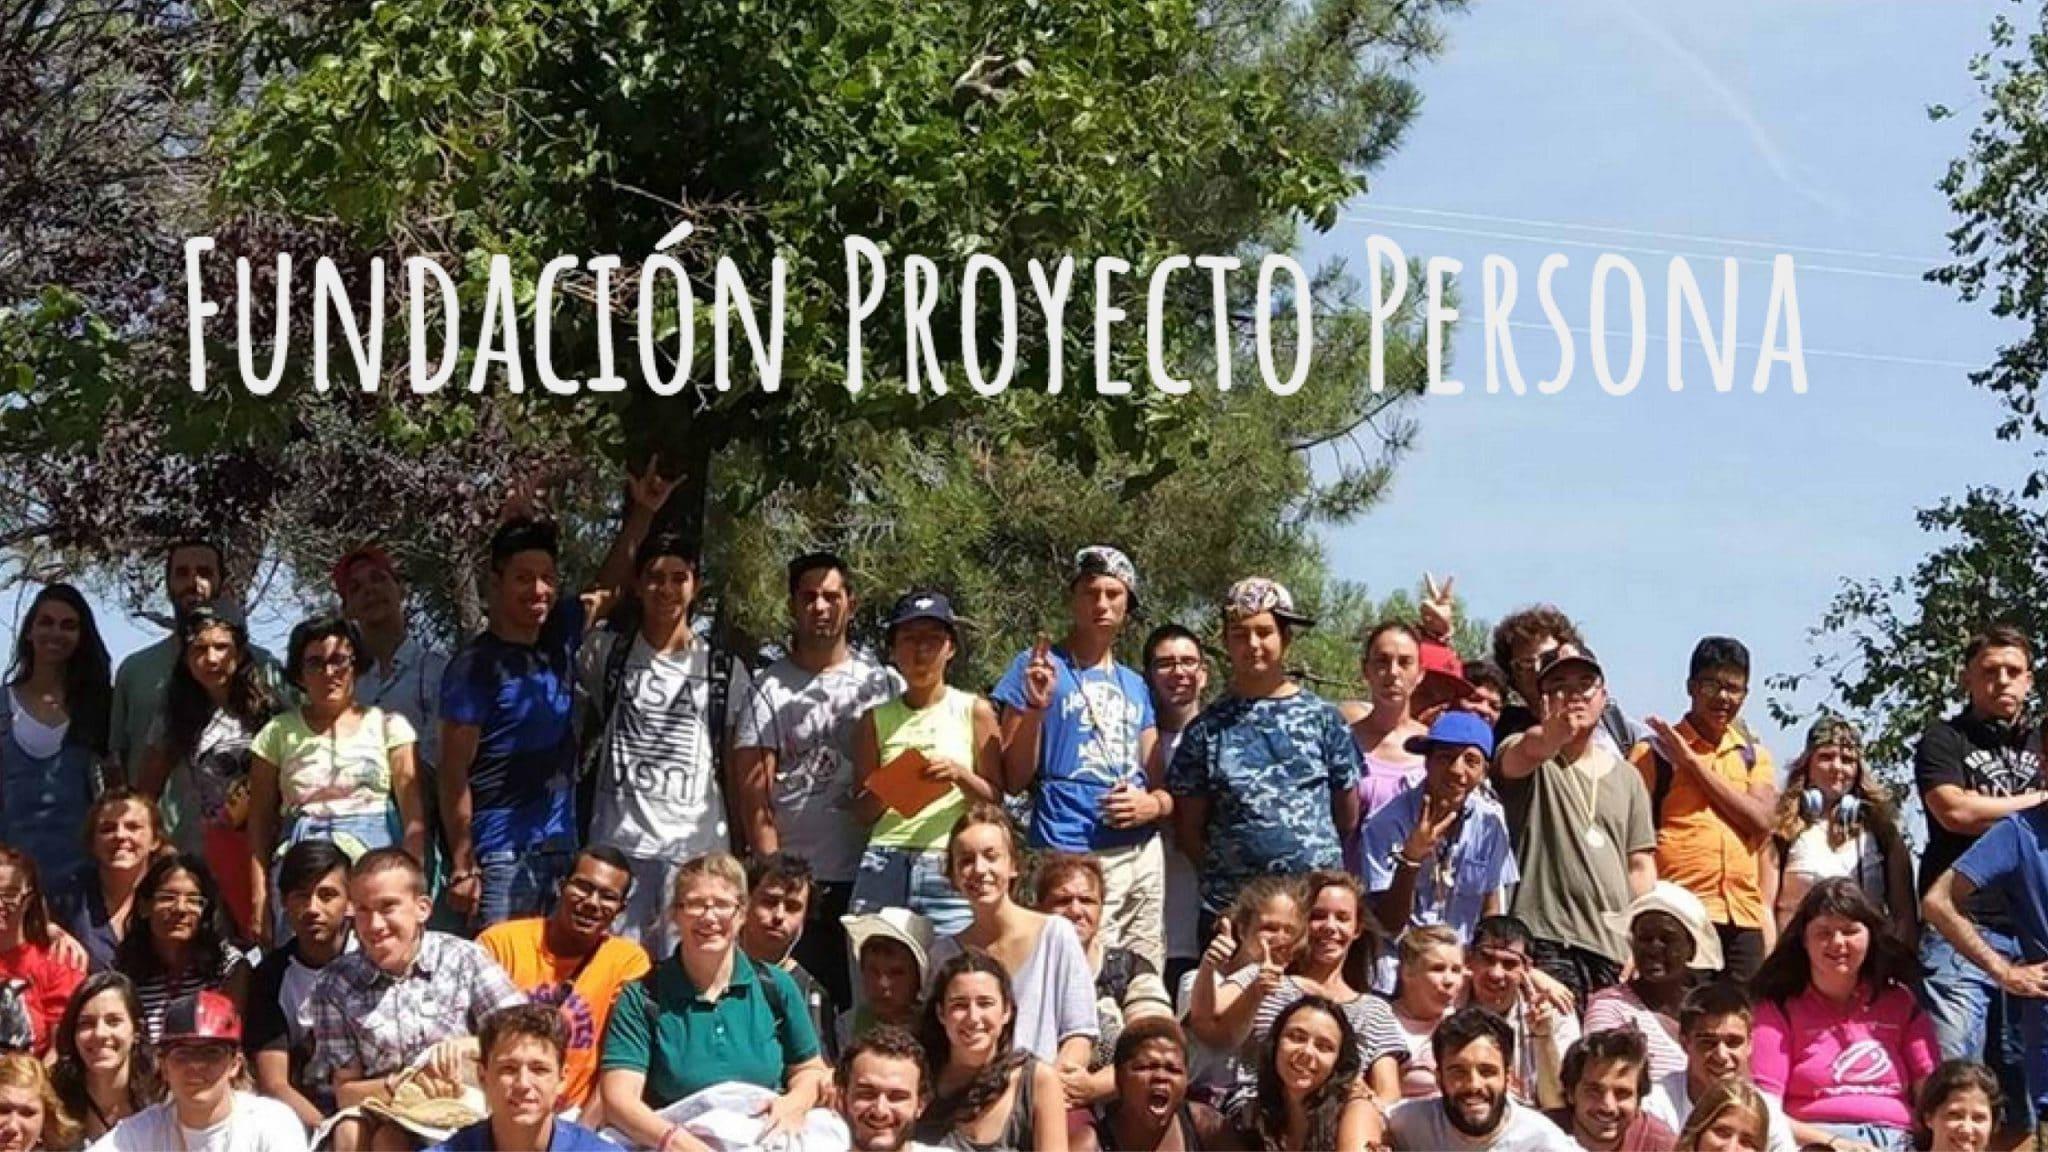 FONDO_Proyecto_Persona